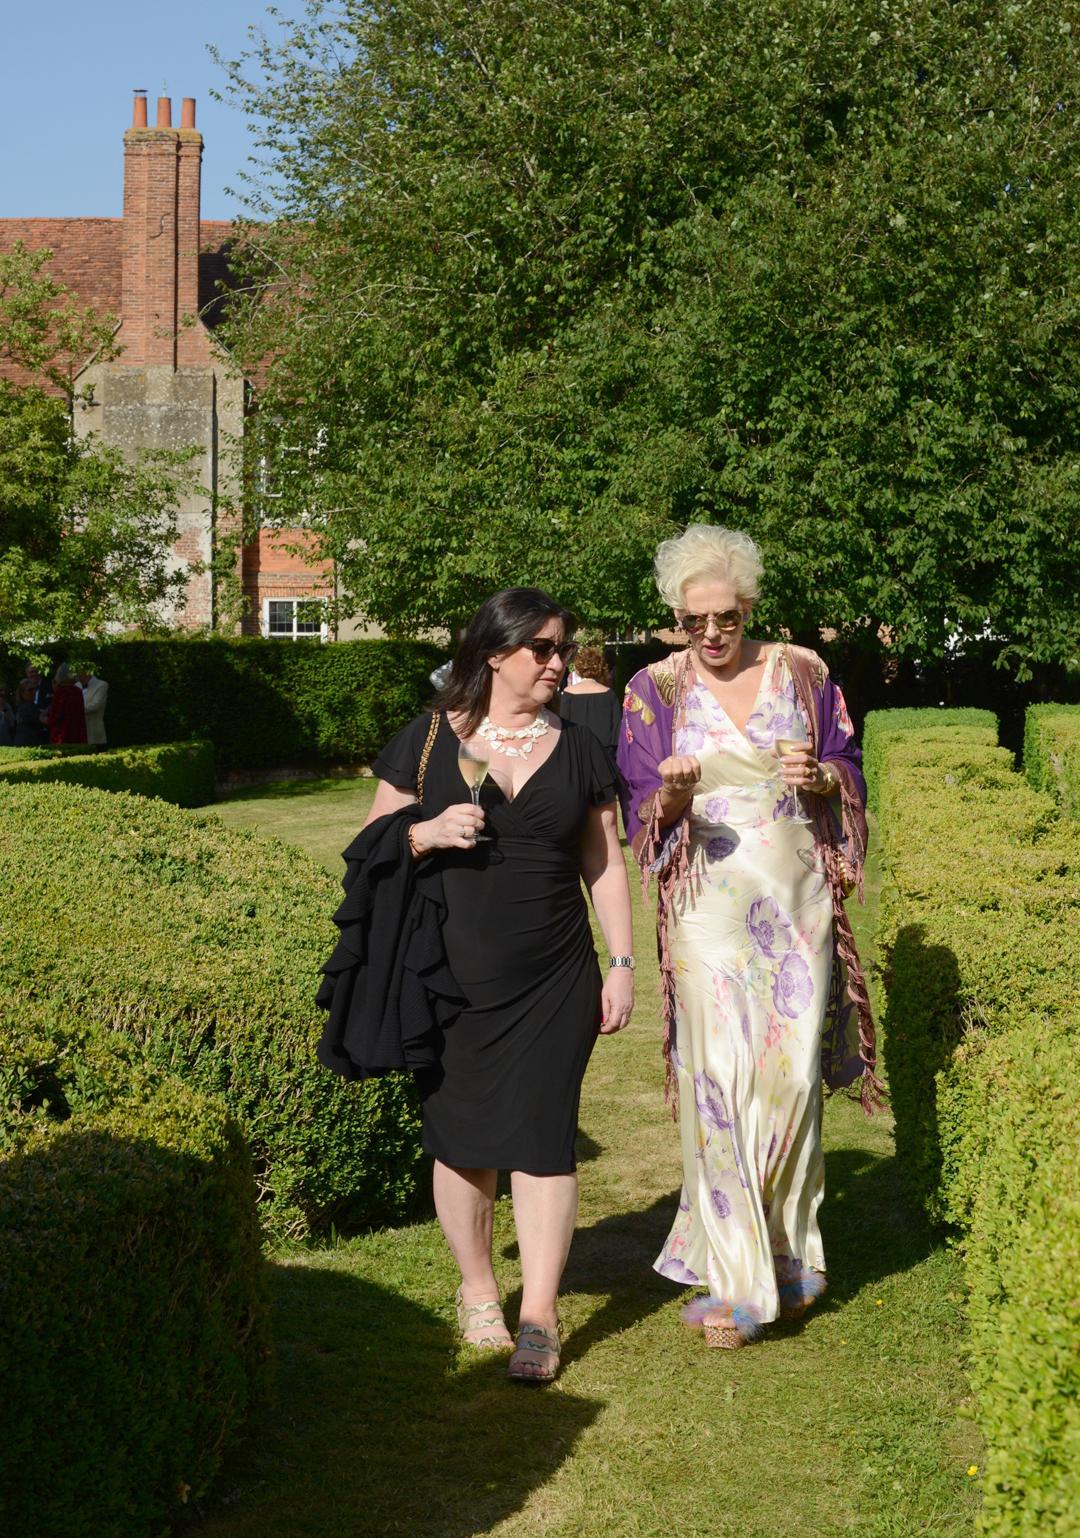 grange park opera photographed by stylist and fashion blogger sara delaney